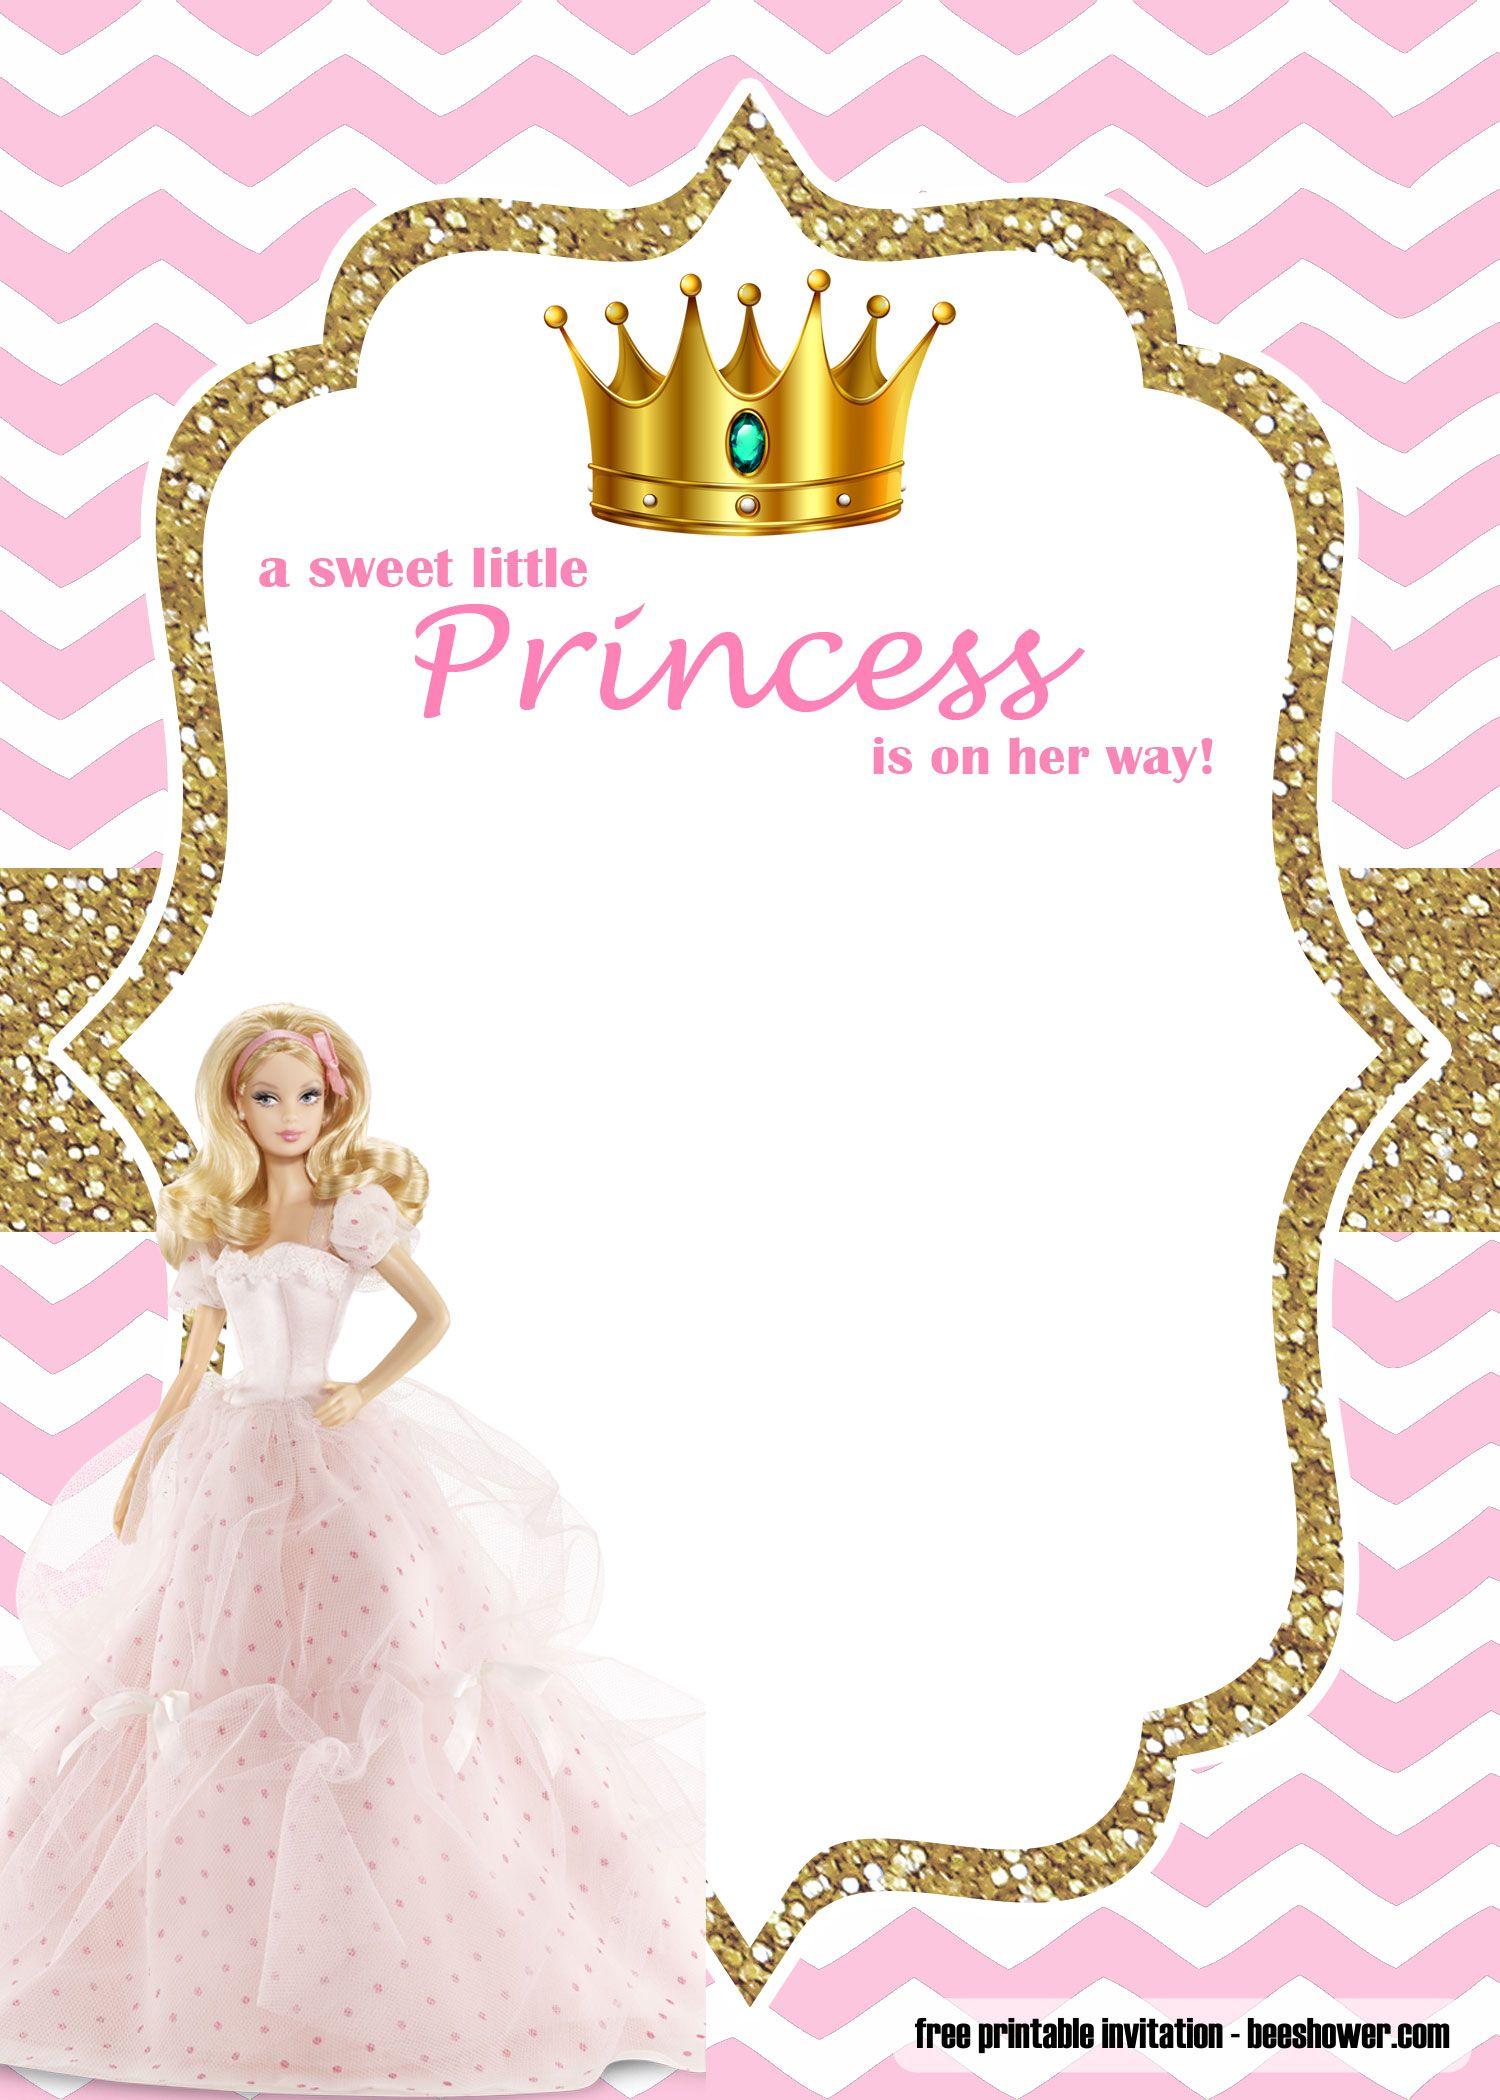 Editable Free Princess Invitation Template